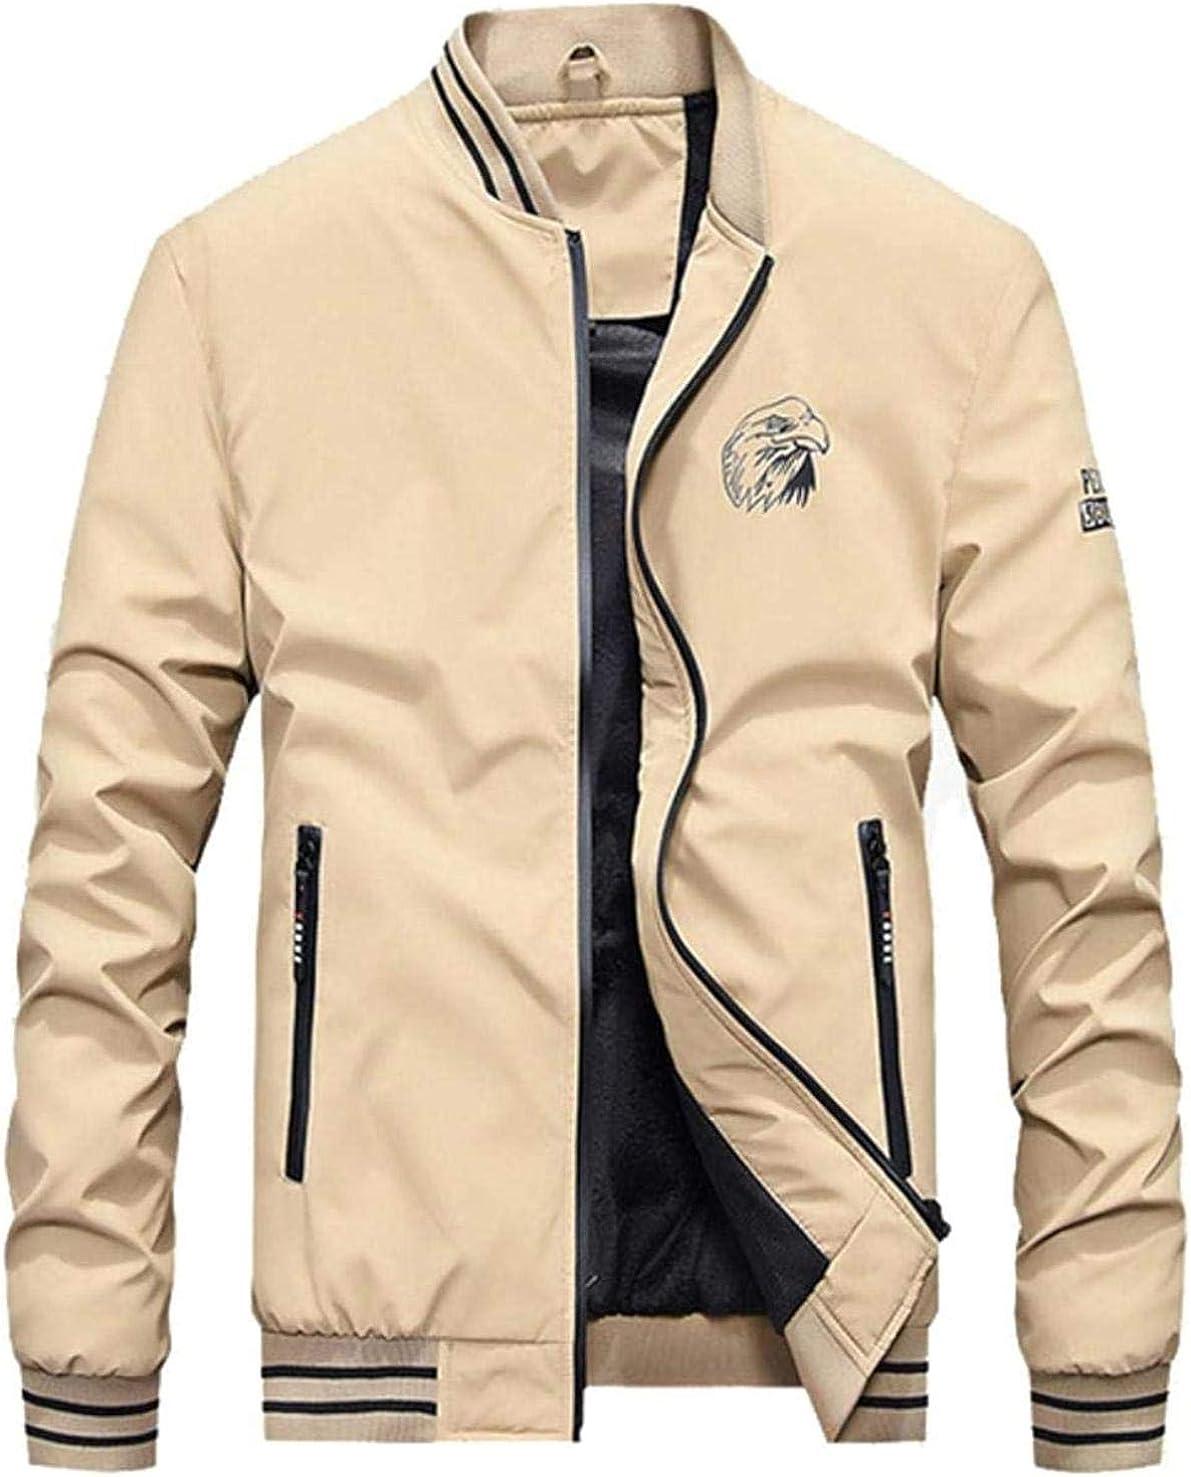 Man Jacket Casual Warm Attention brand Men Comfort Business Black Zipper Winter Max 64% OFF